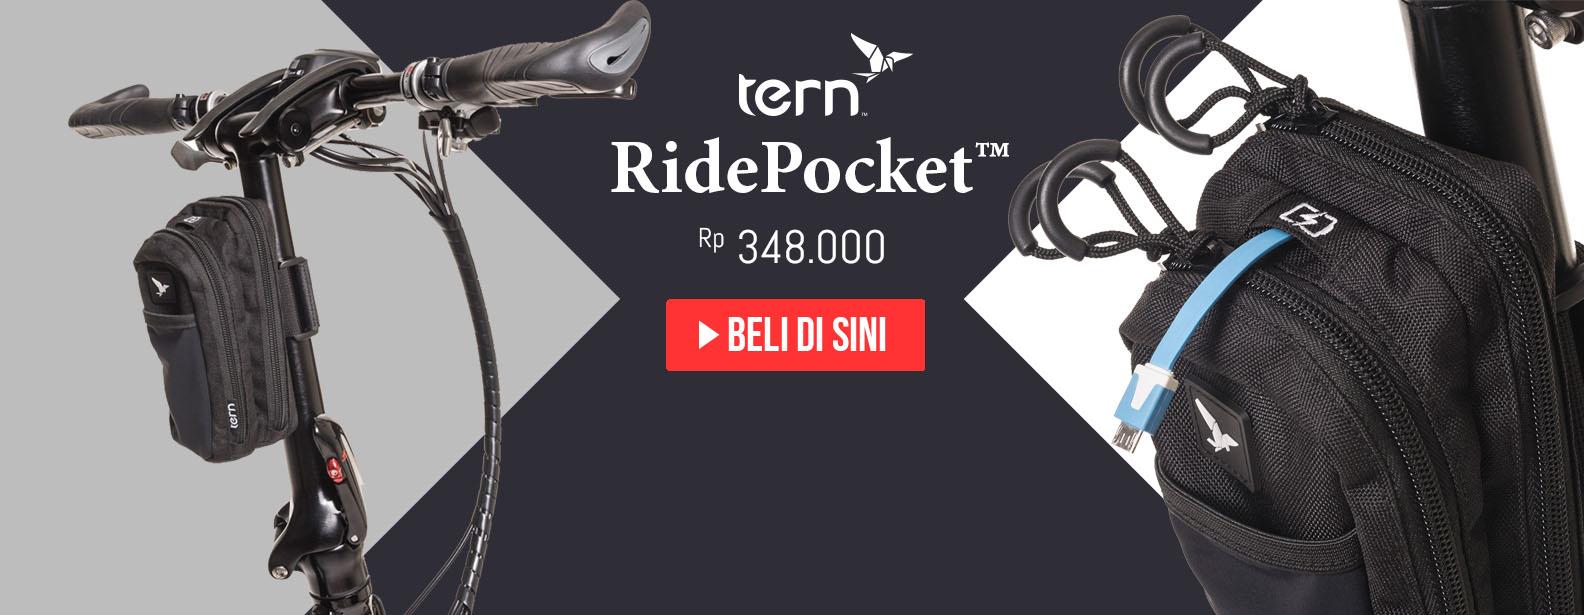 Tern Tas Handlepost Sepeda RidePocket